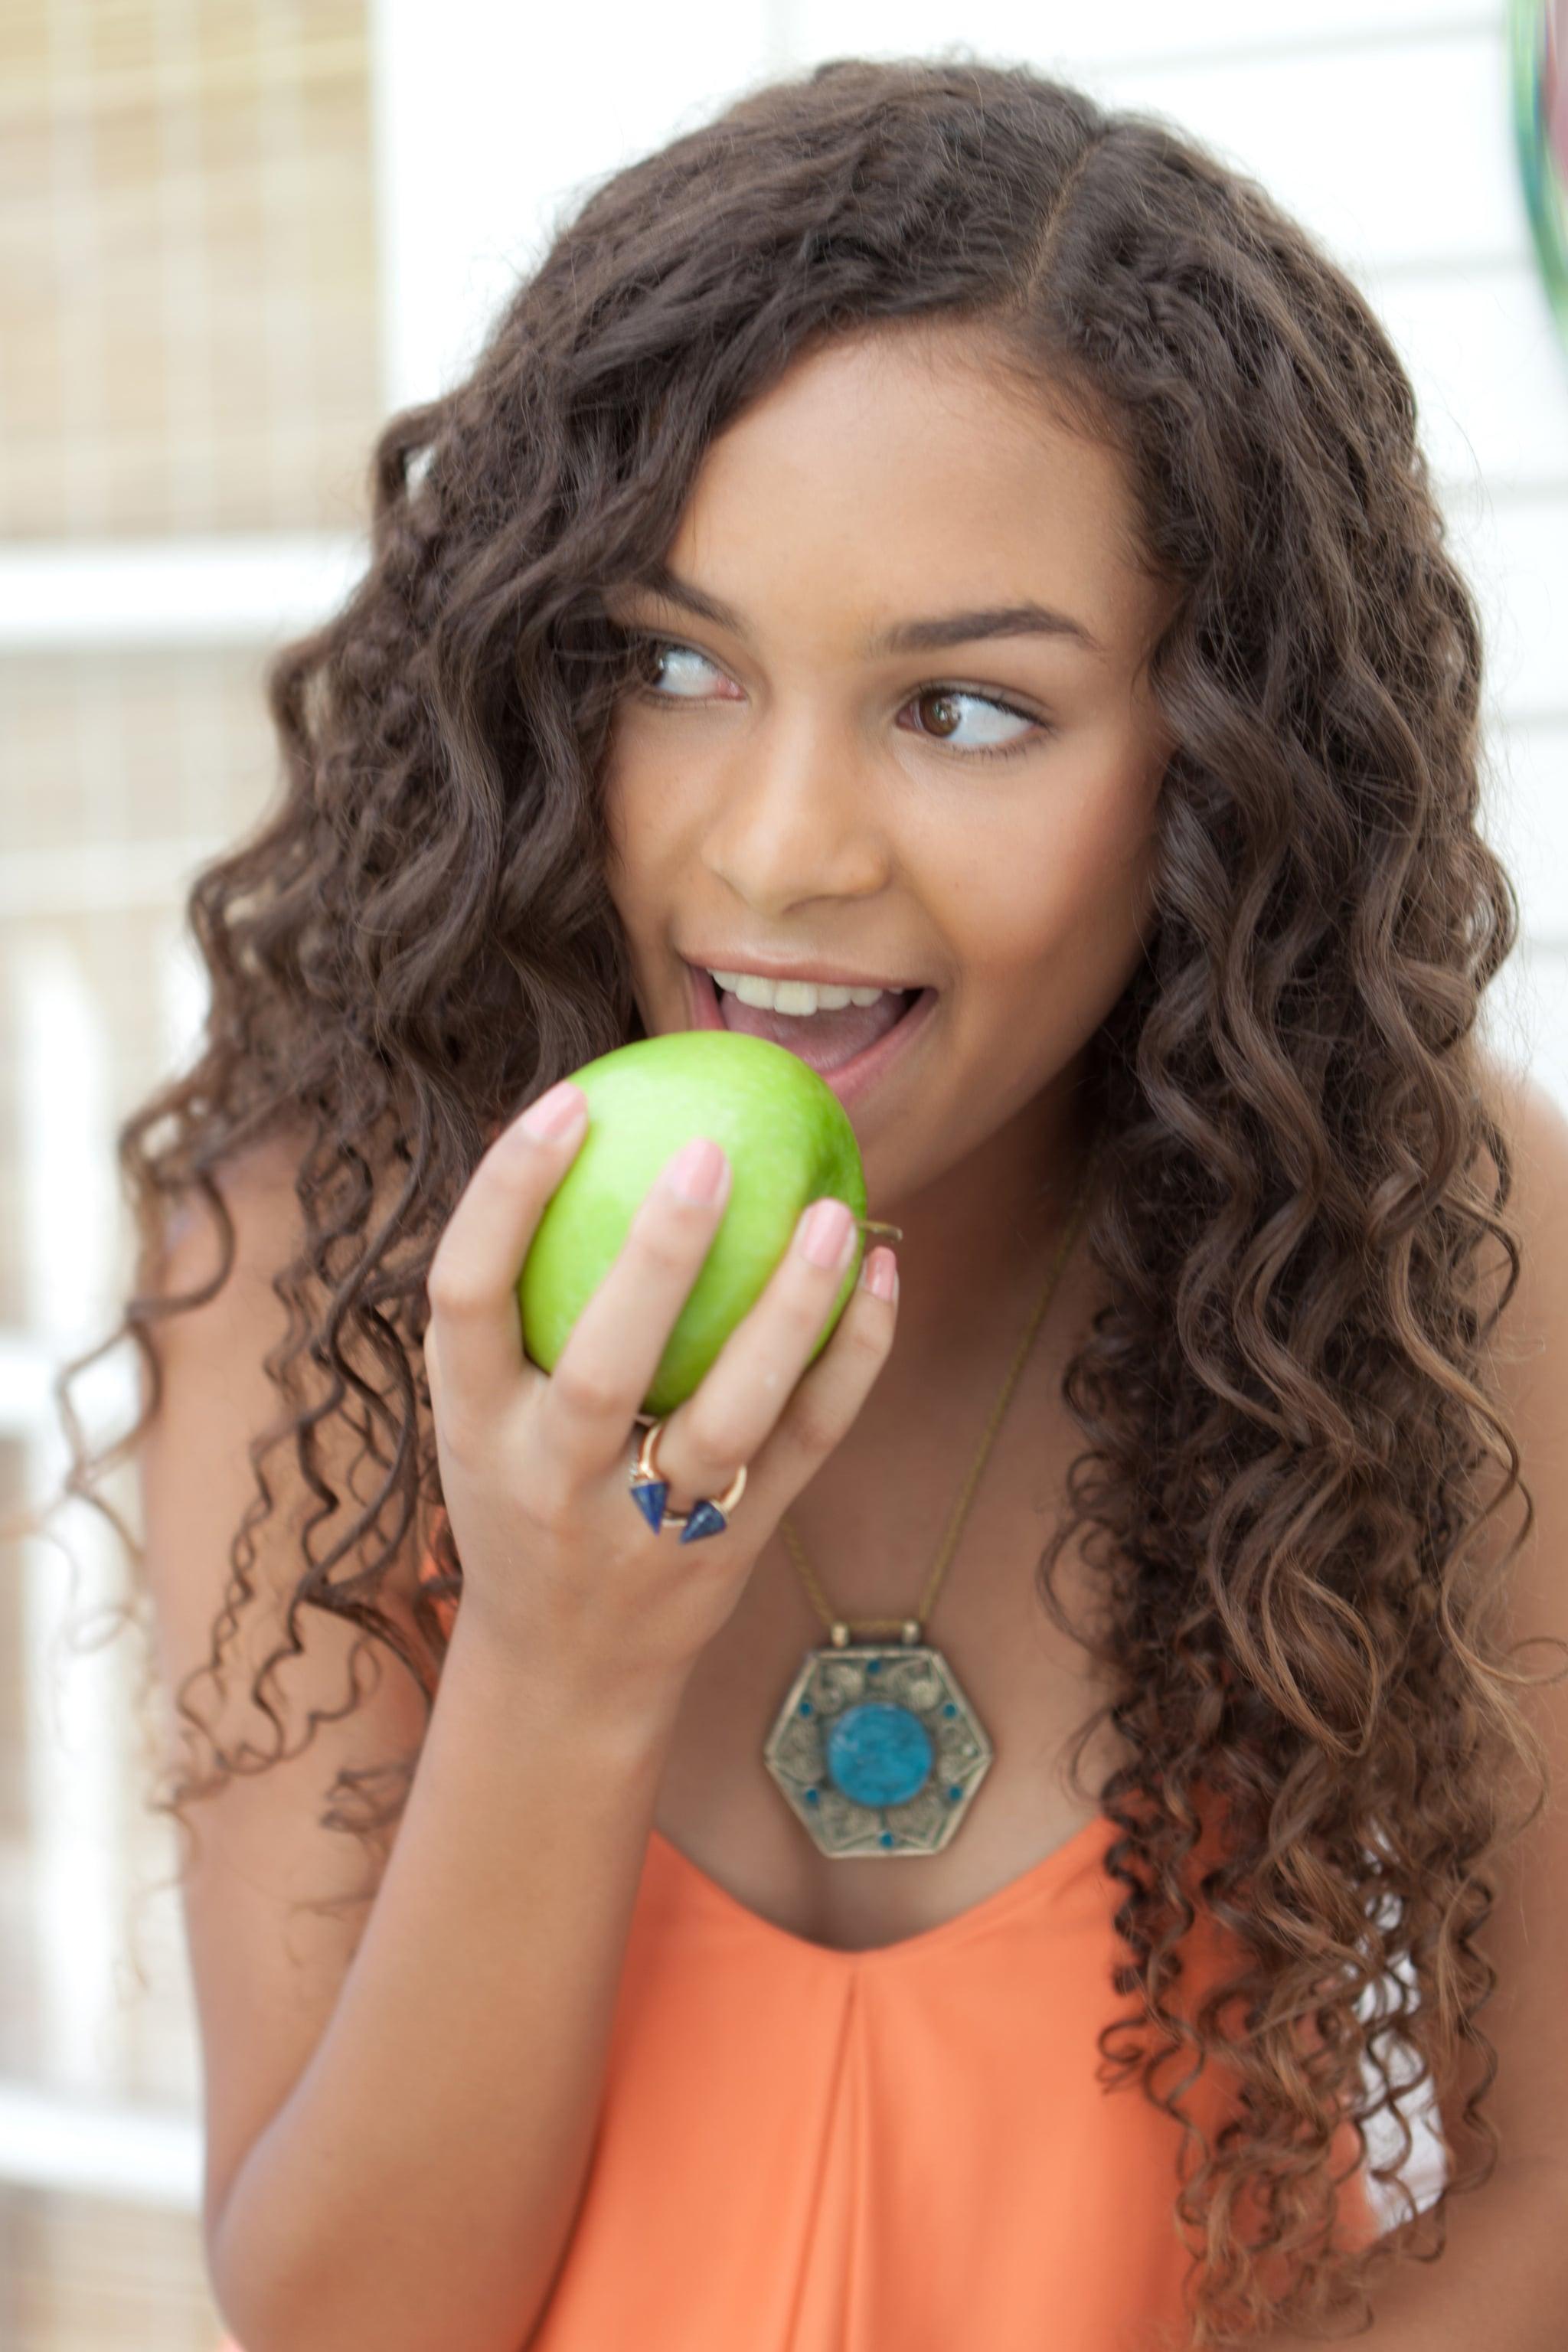 This Weight-Loss Eating Plan Involves Eating Carbs!